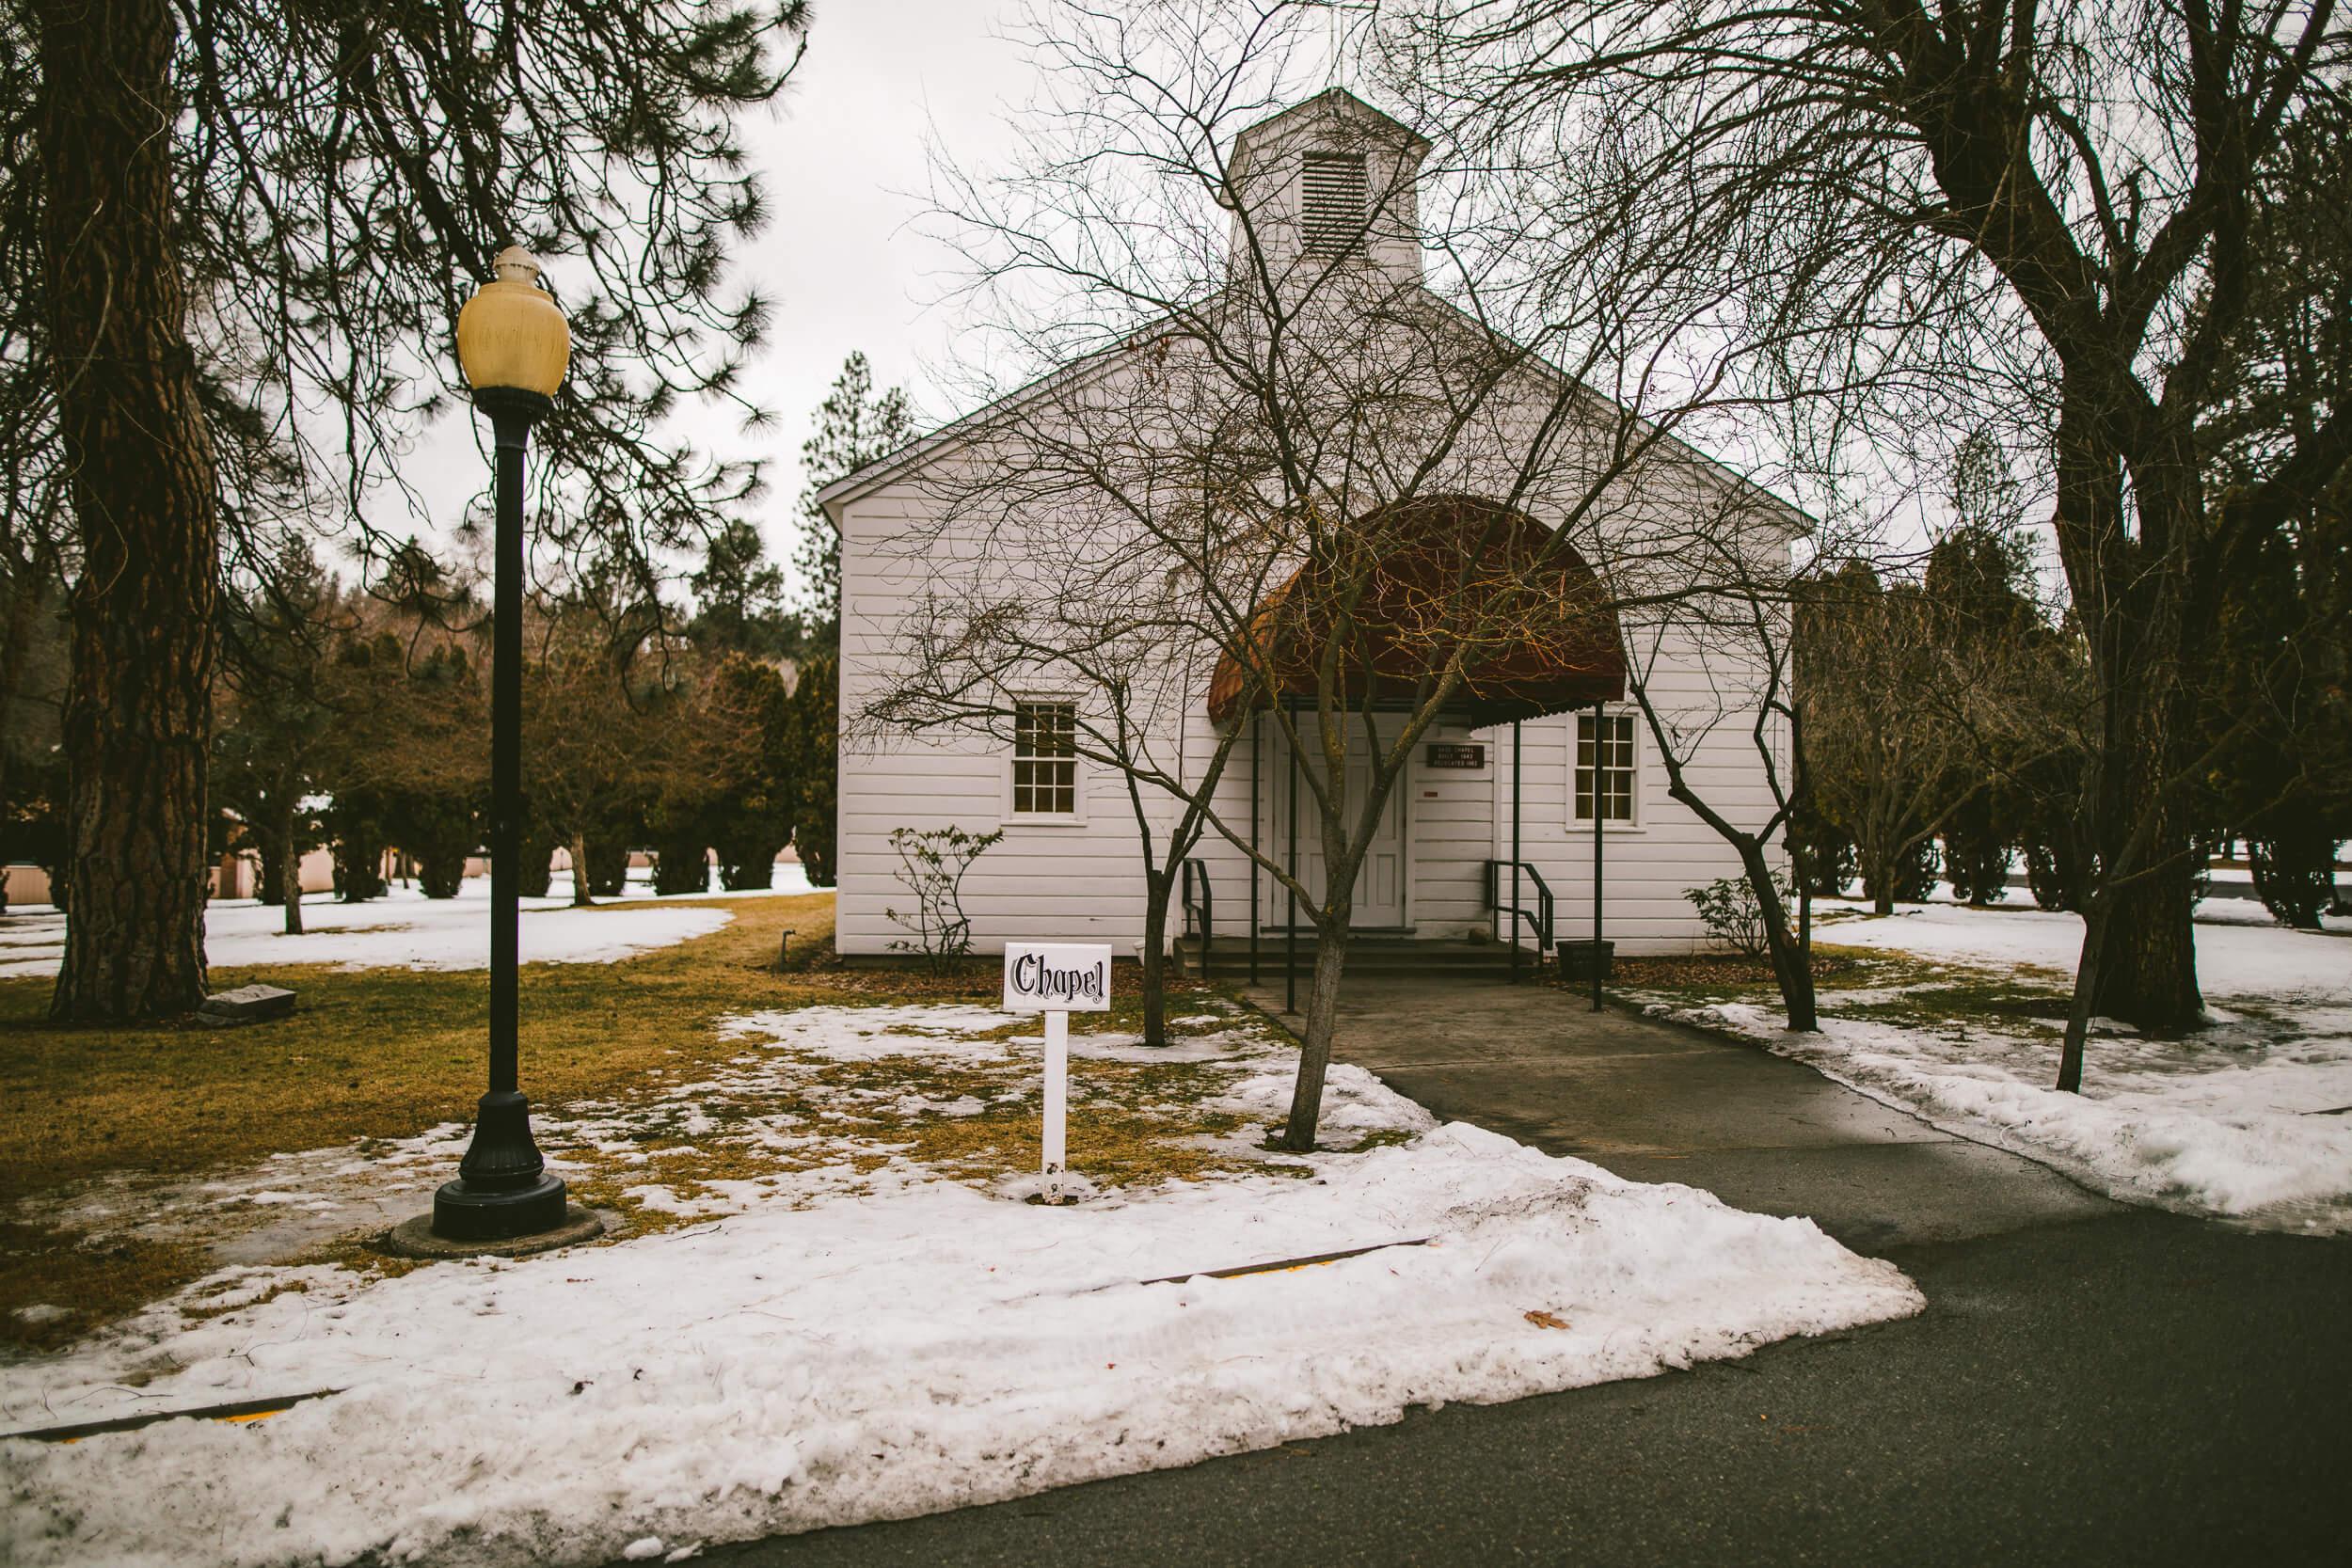 mukogawa winter wedding in spokane (1).jpg